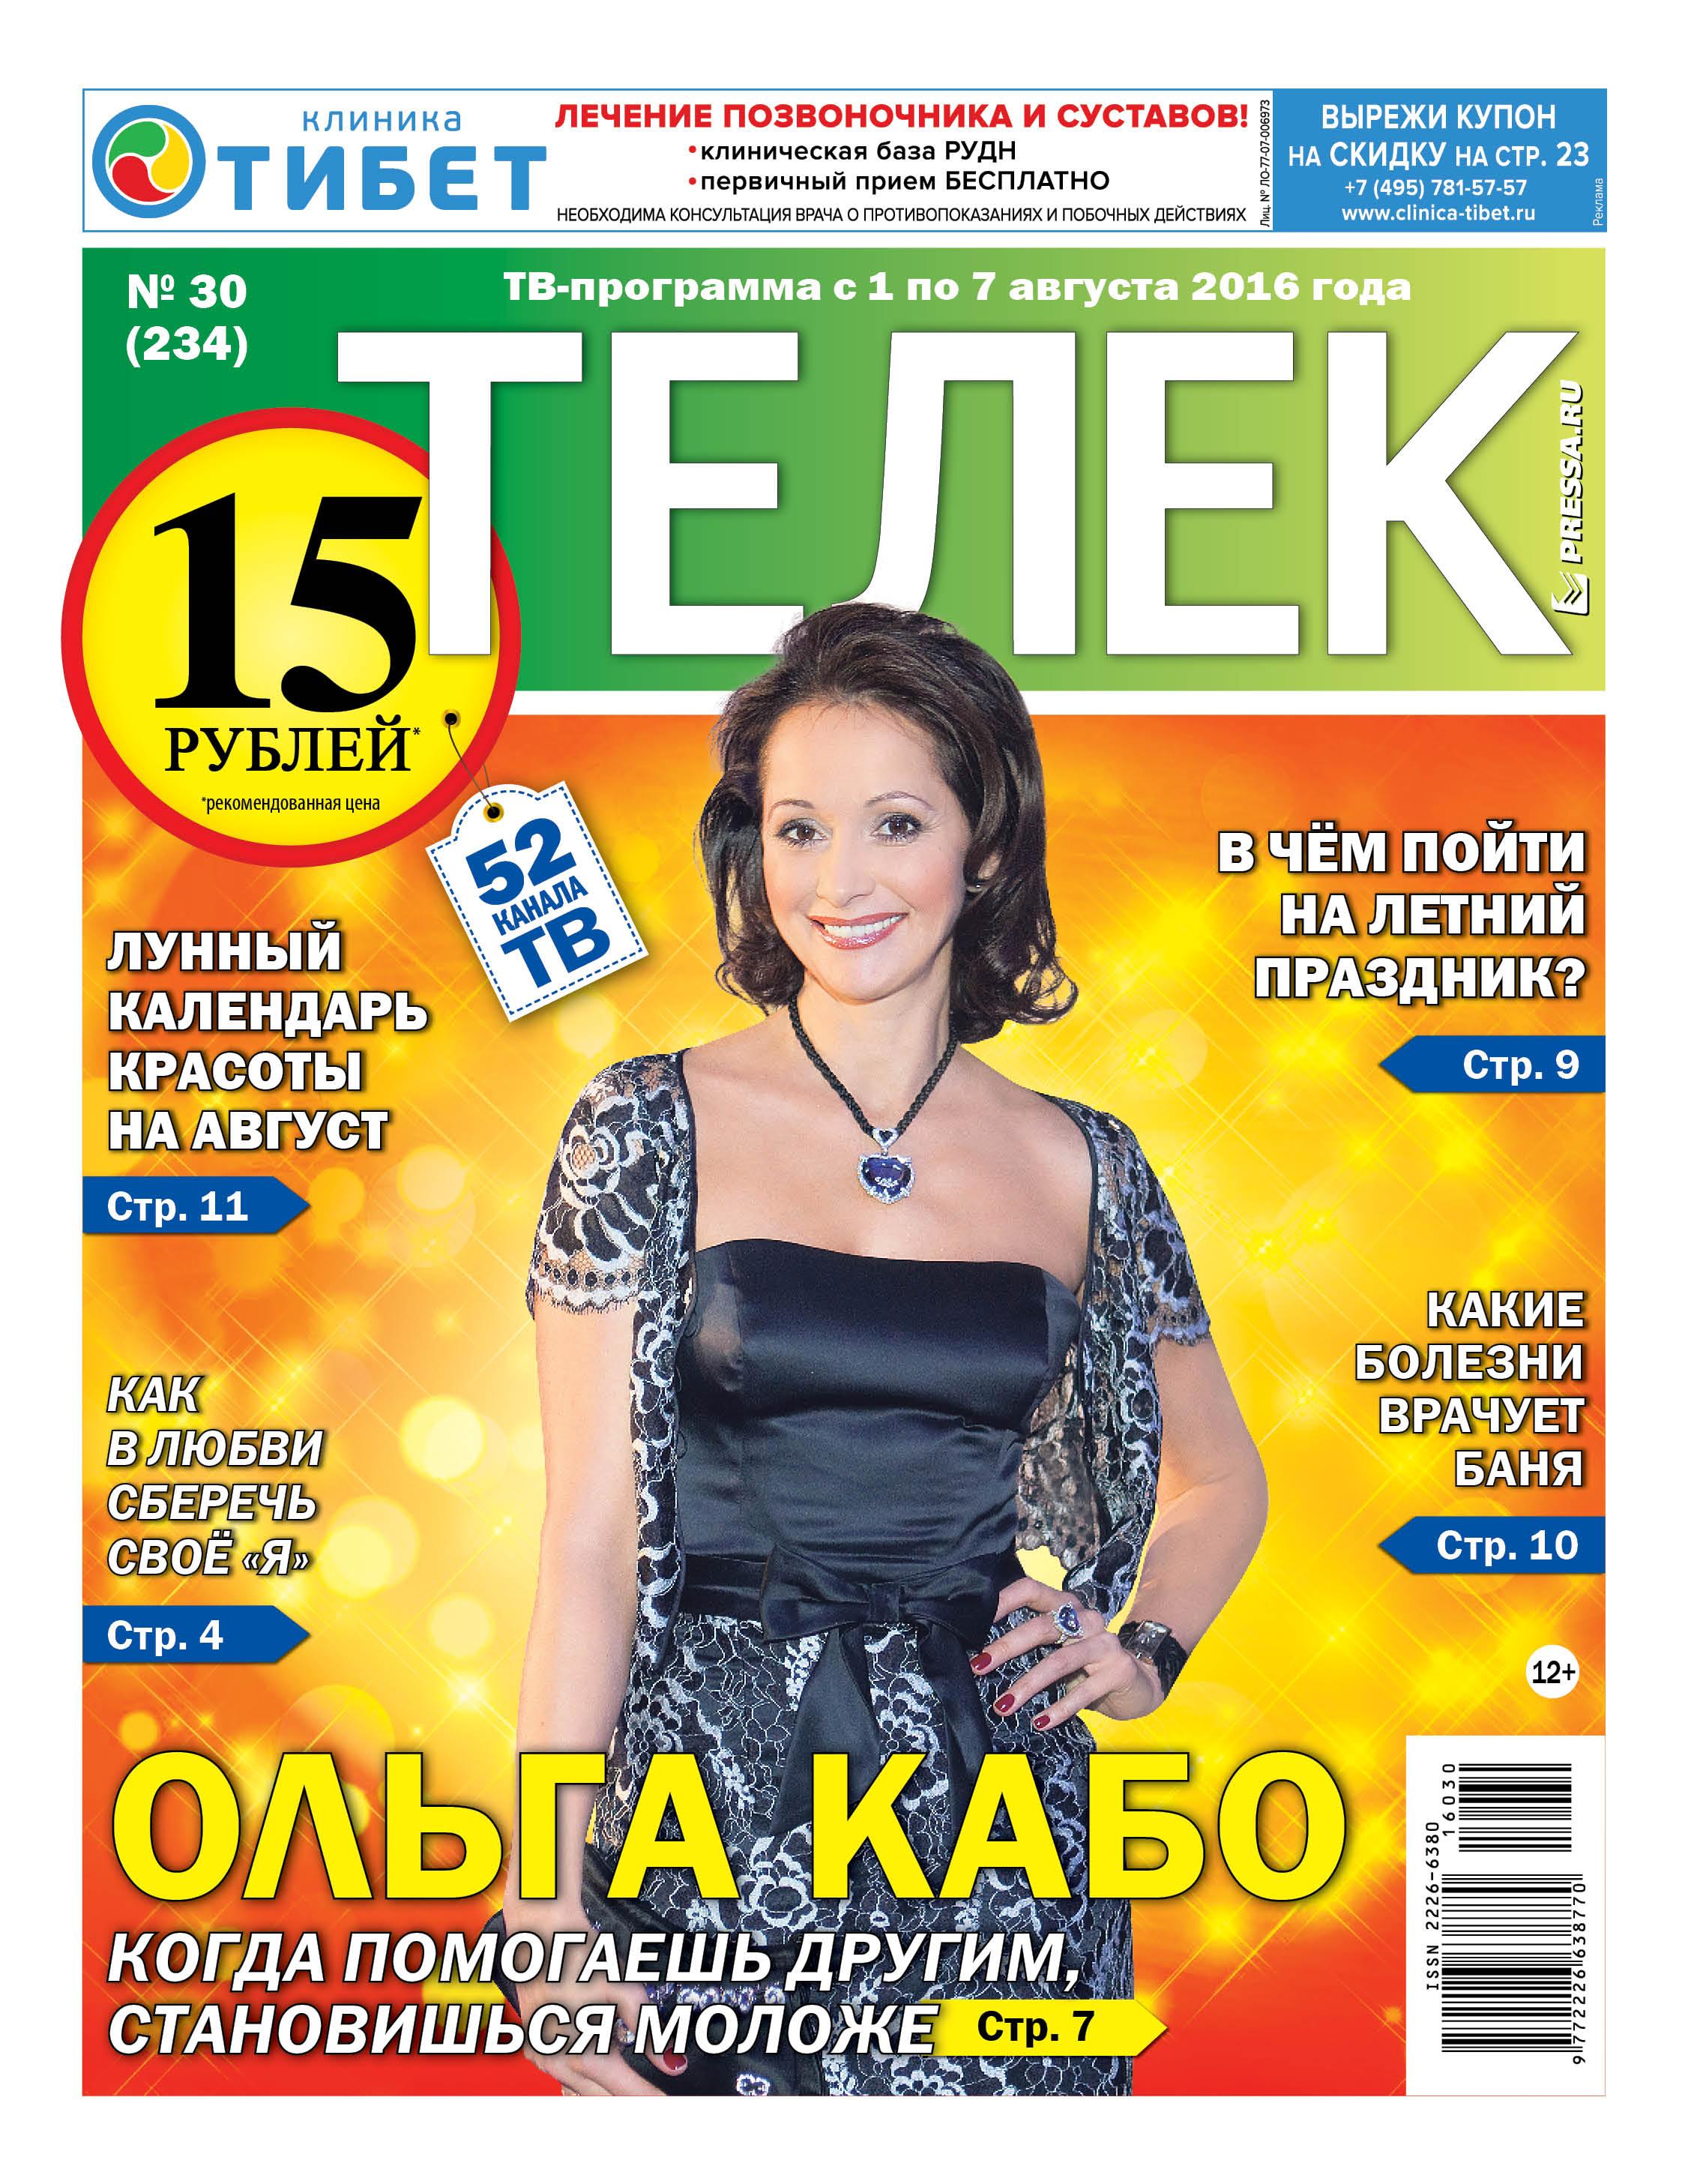 №30 (234) Ольга Кабо